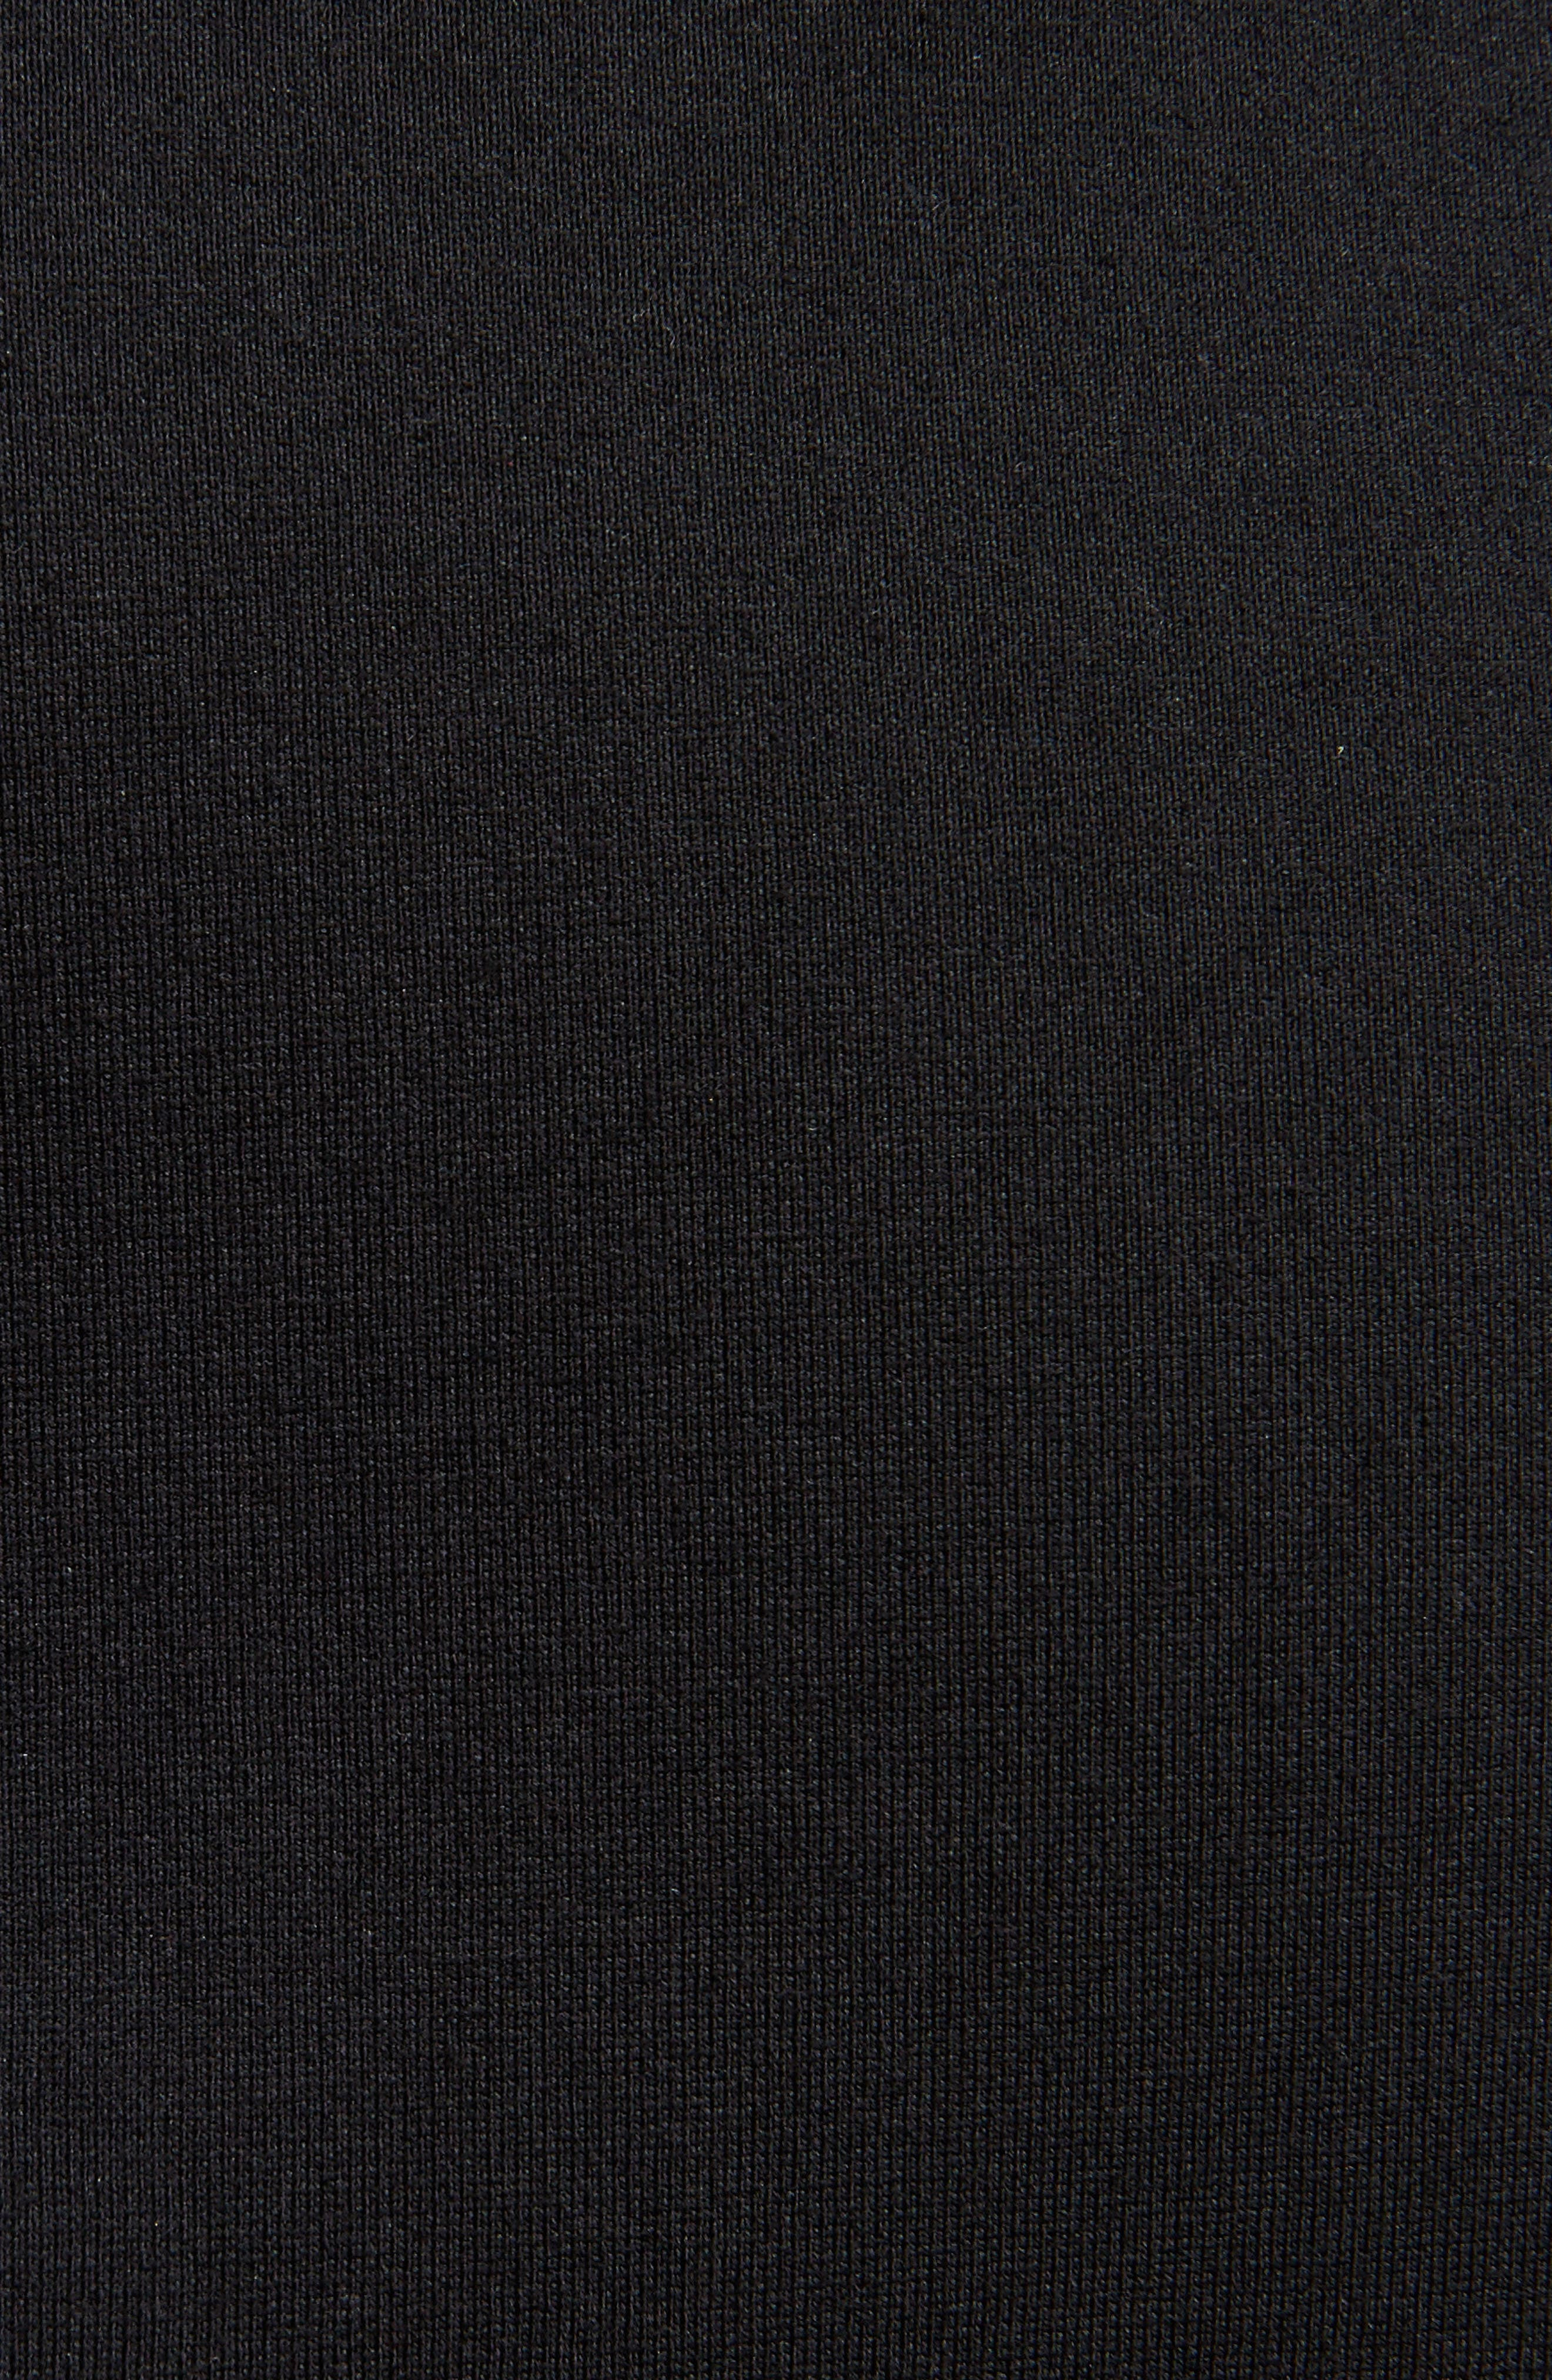 Asymmetrical Ruffle Skirt,                             Alternate thumbnail 6, color,                             Black